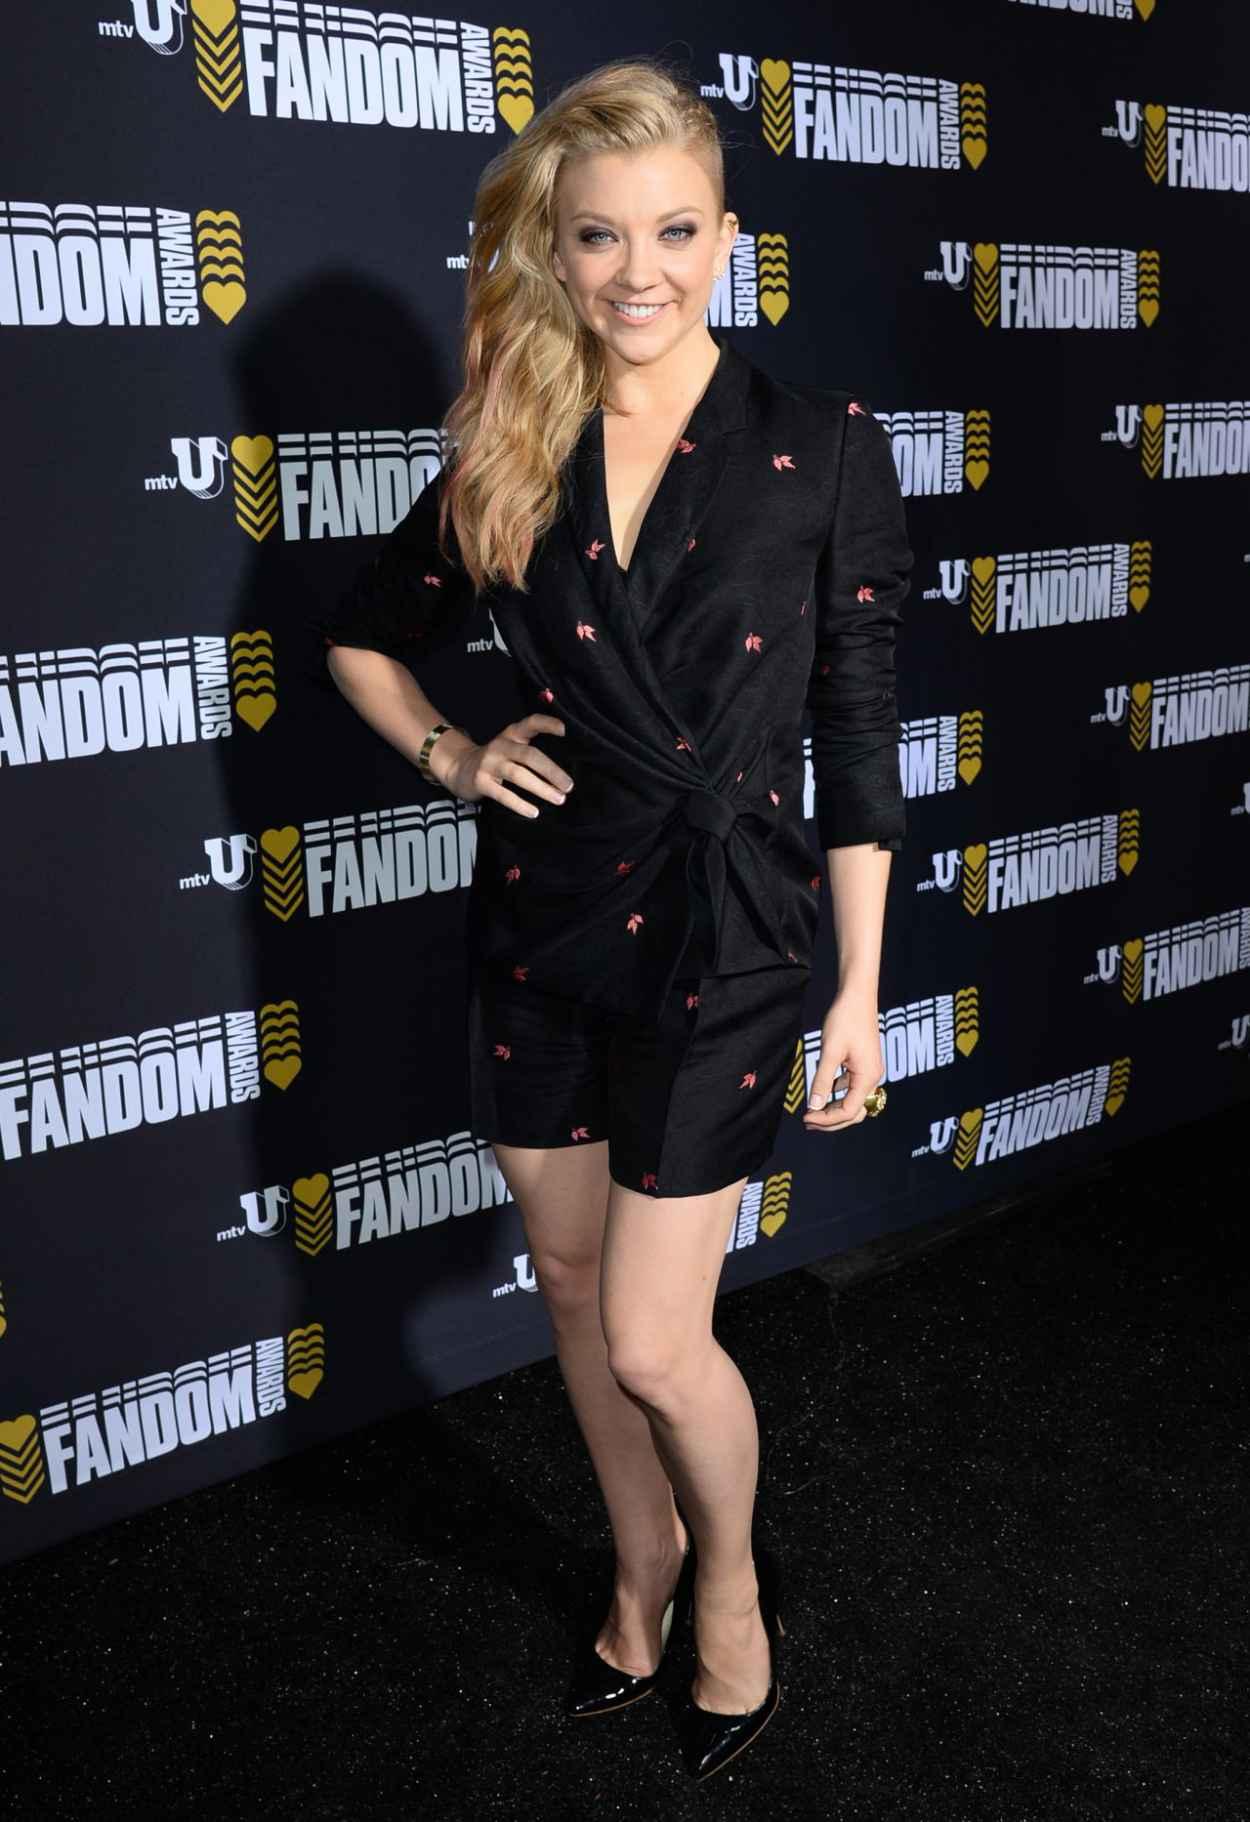 Natalie Dormer - mtvU Fandom Awards 2015 at San Diego International Comic-Con-1